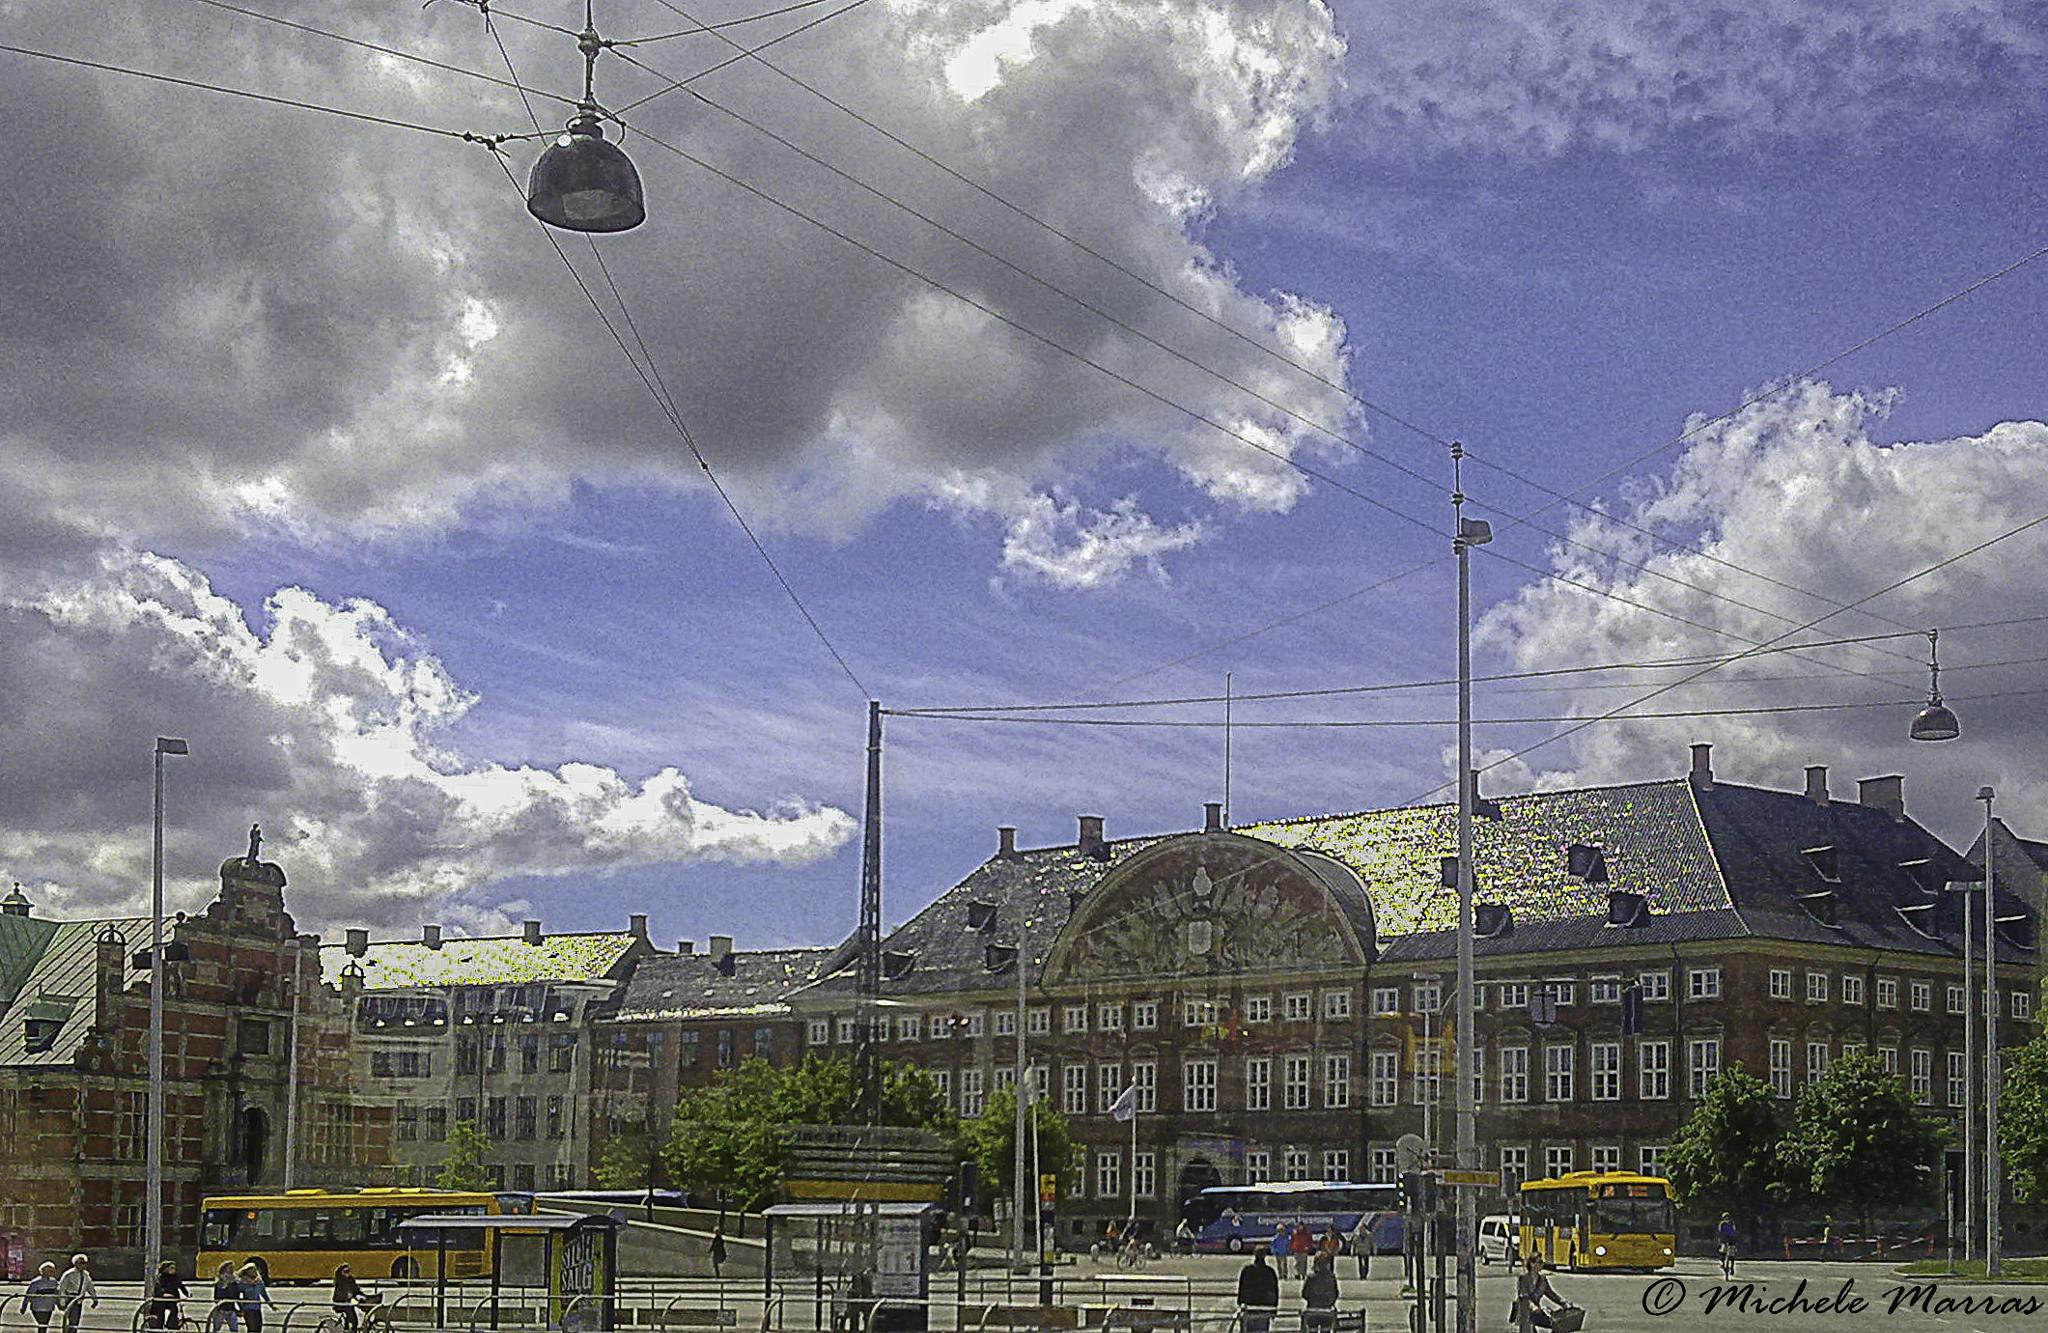 The Copenaghen street by Michele Pinna Marras